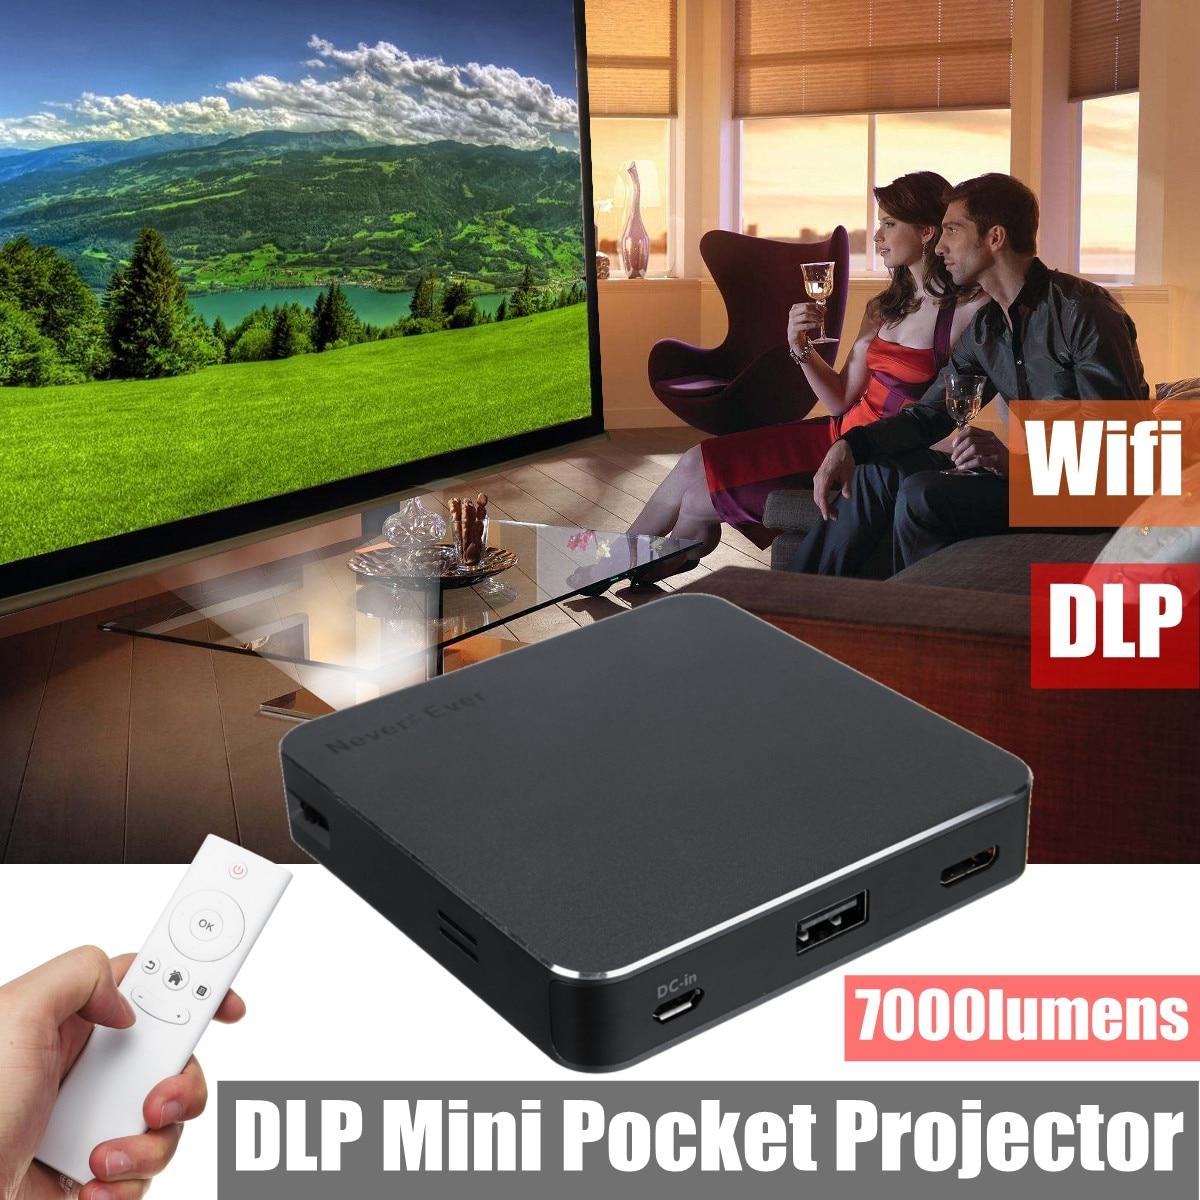 DLP-S5 Wifi DLP 7000 Lumens HD 1080P Mini P ocket LED Video Projector HD USB Multimedia Pocket Projektor yt v3d p 3d dlp projector hd video hdmi converter black